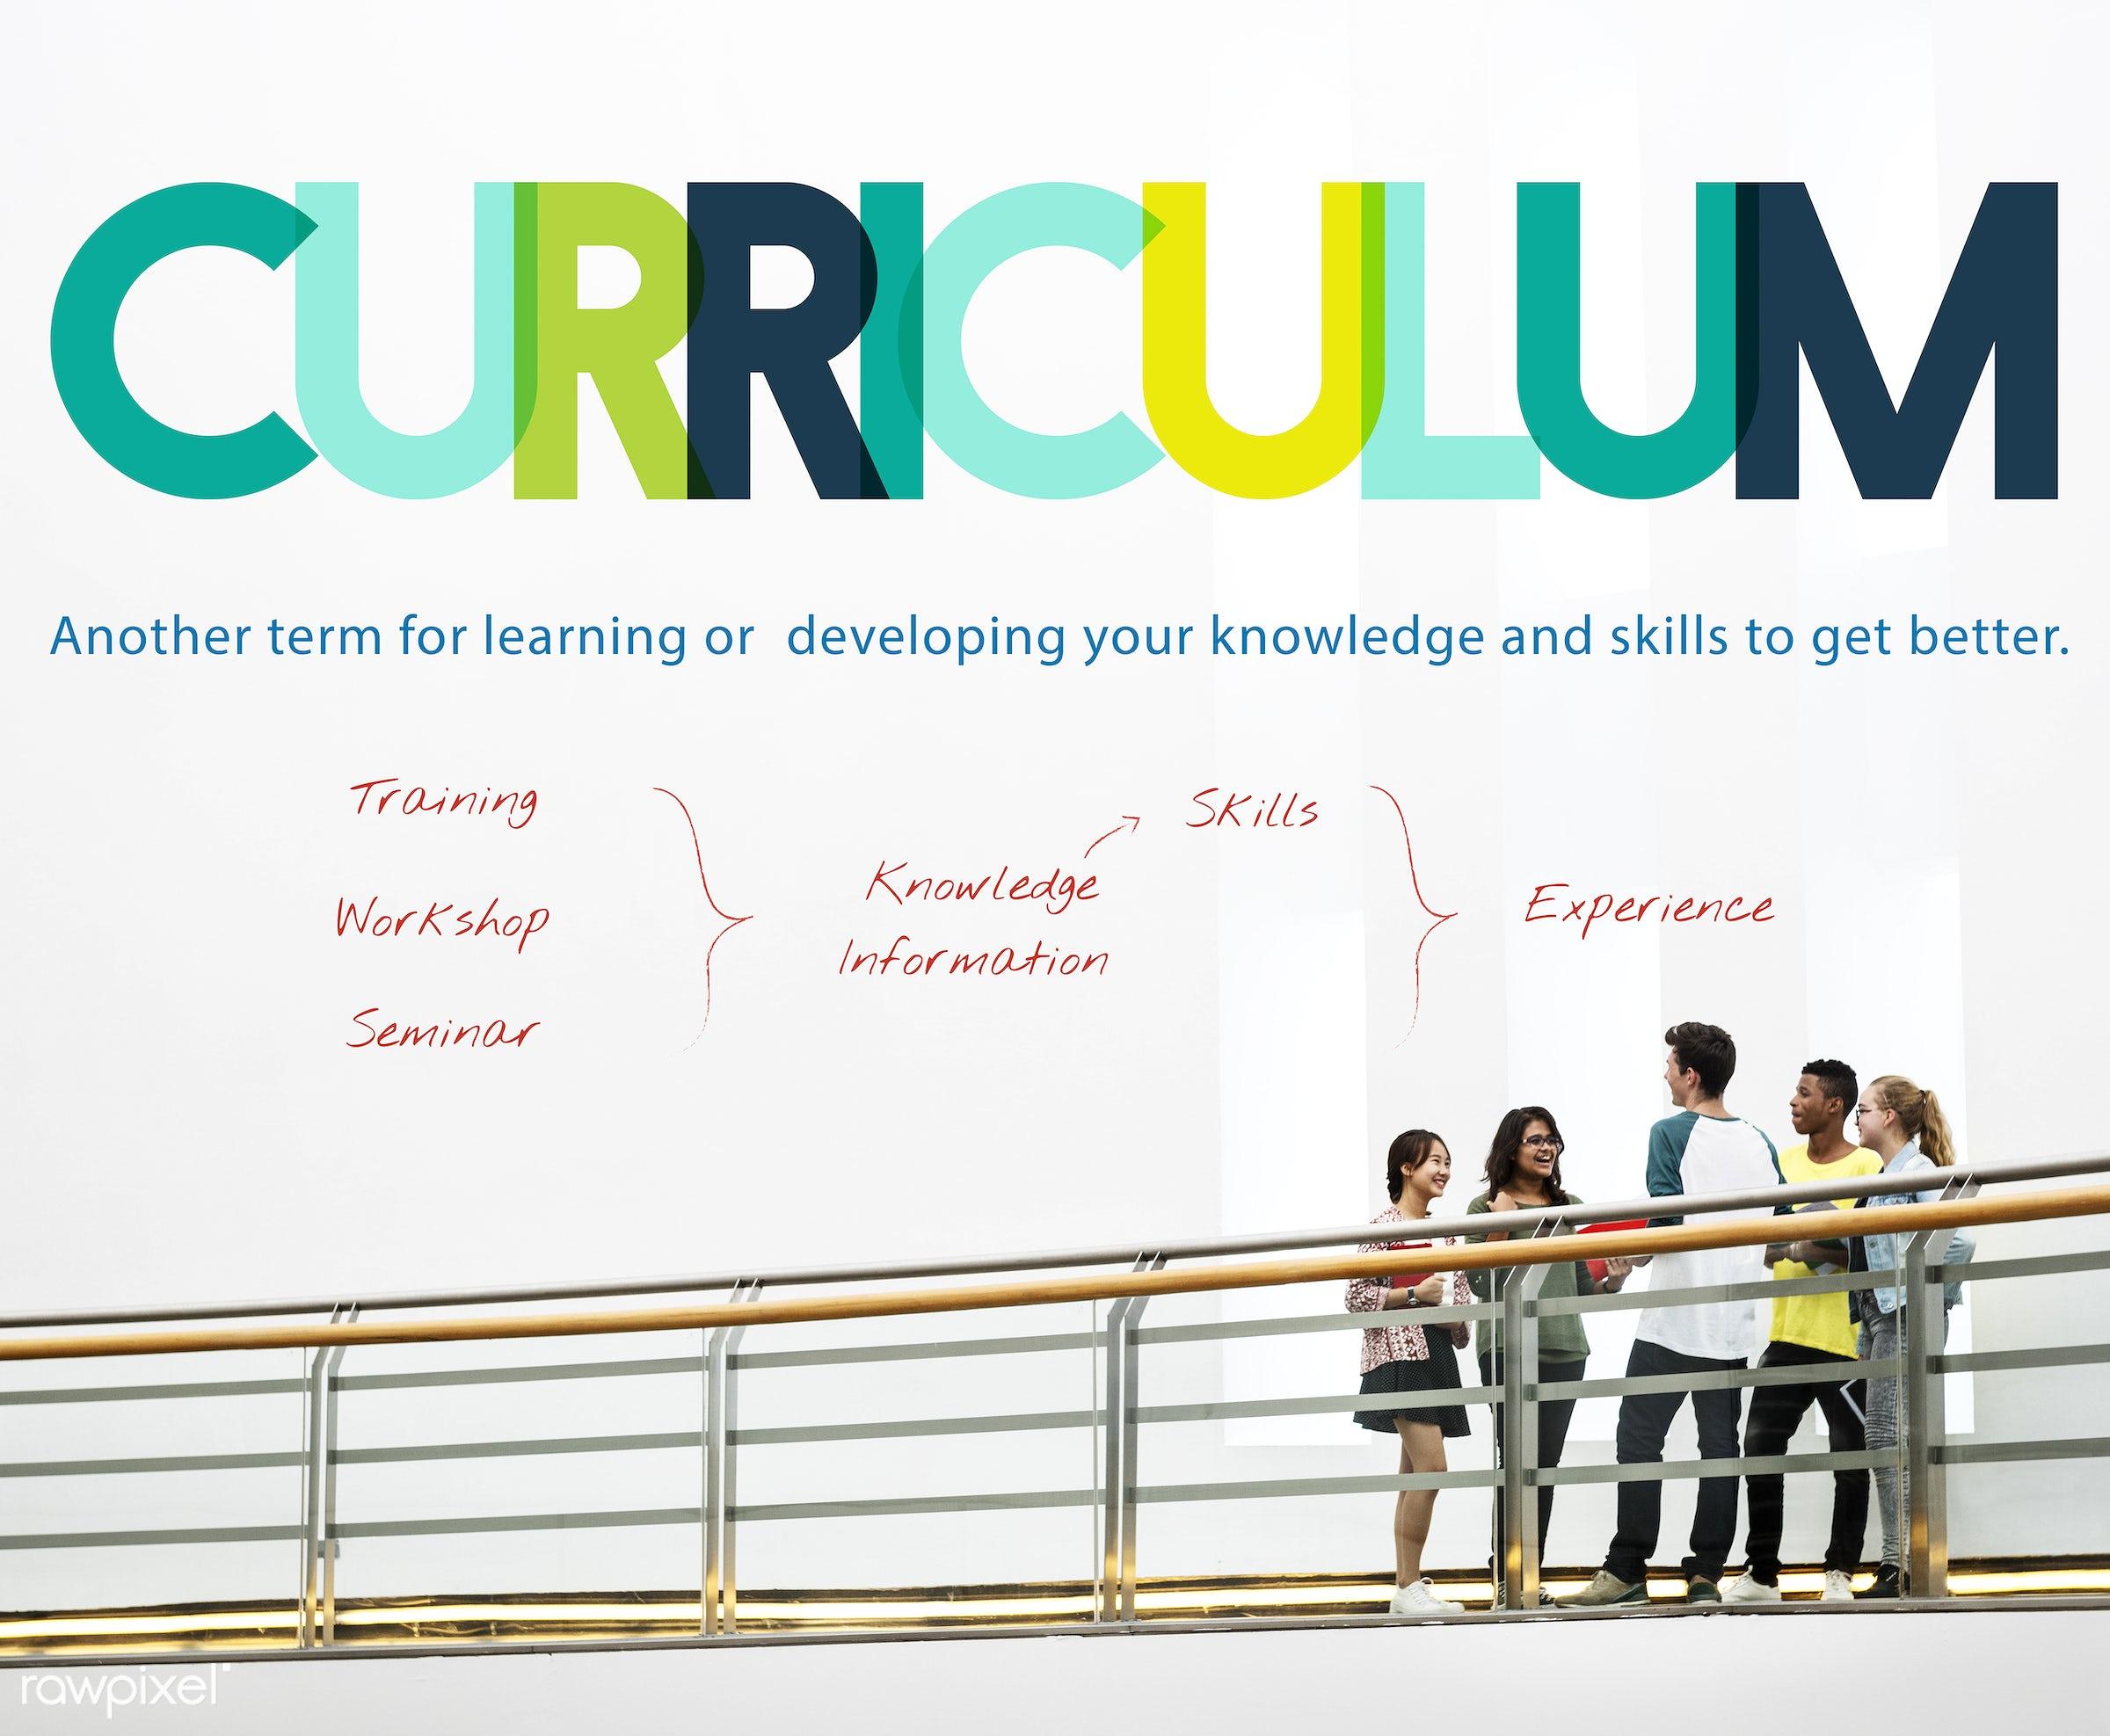 academics, book, books, boy, bridge, carrying, curriculum, education, expertise, friends, friendship, genius, girls, group...